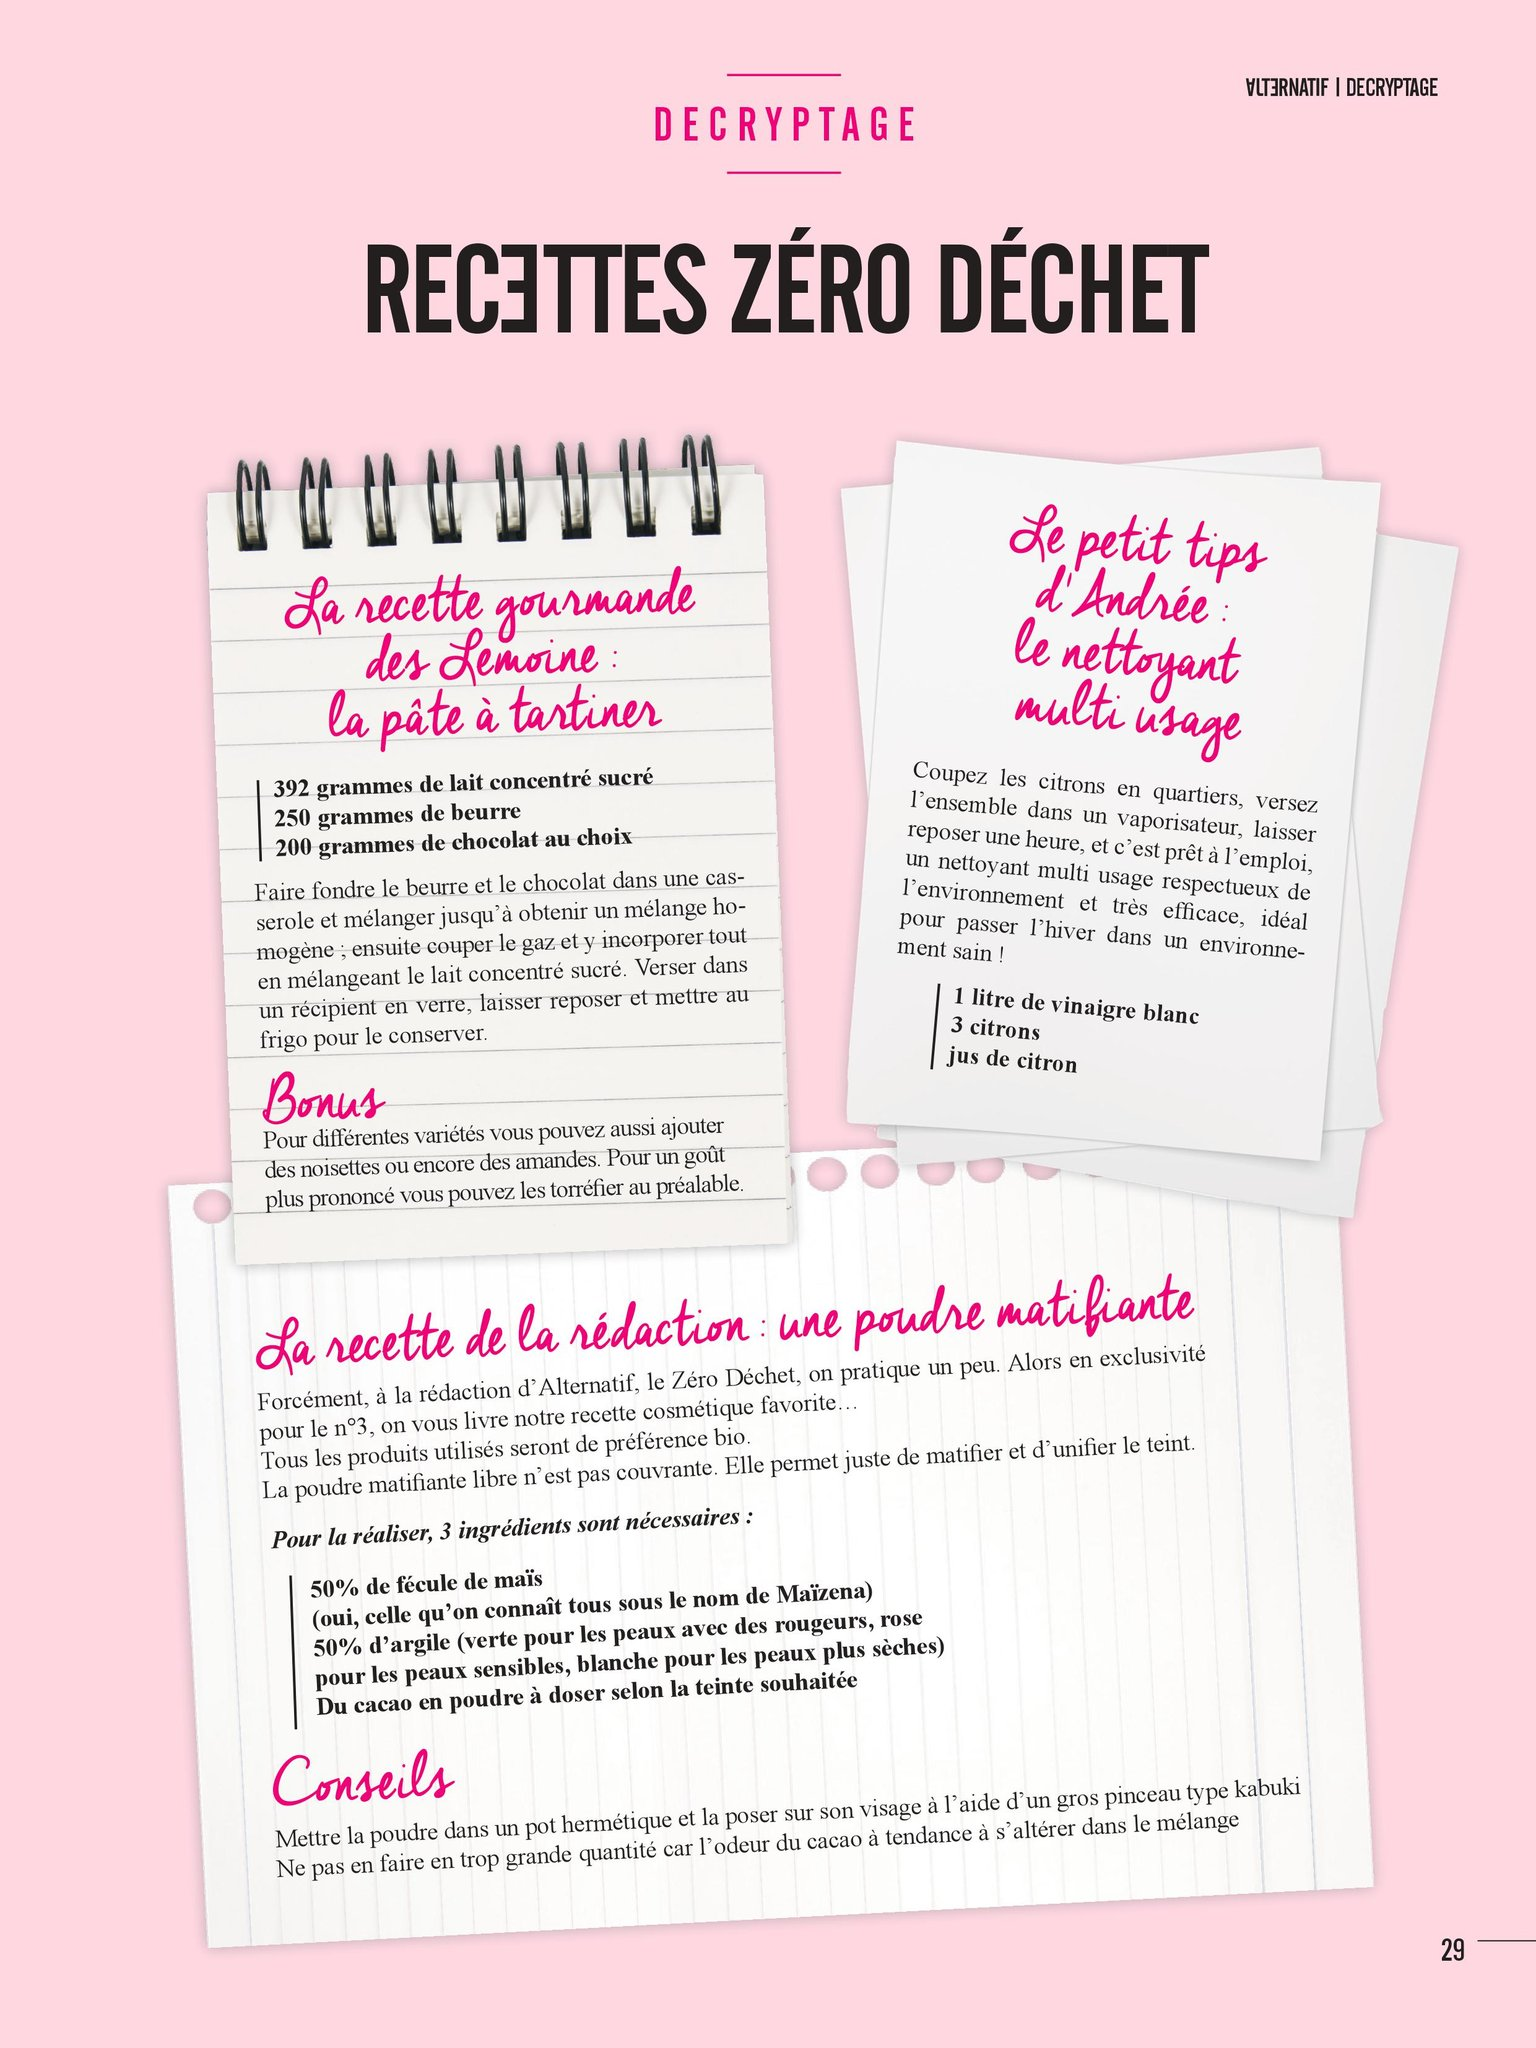 Alternatif On Twitter Le Zerodechet Une Aventure 100